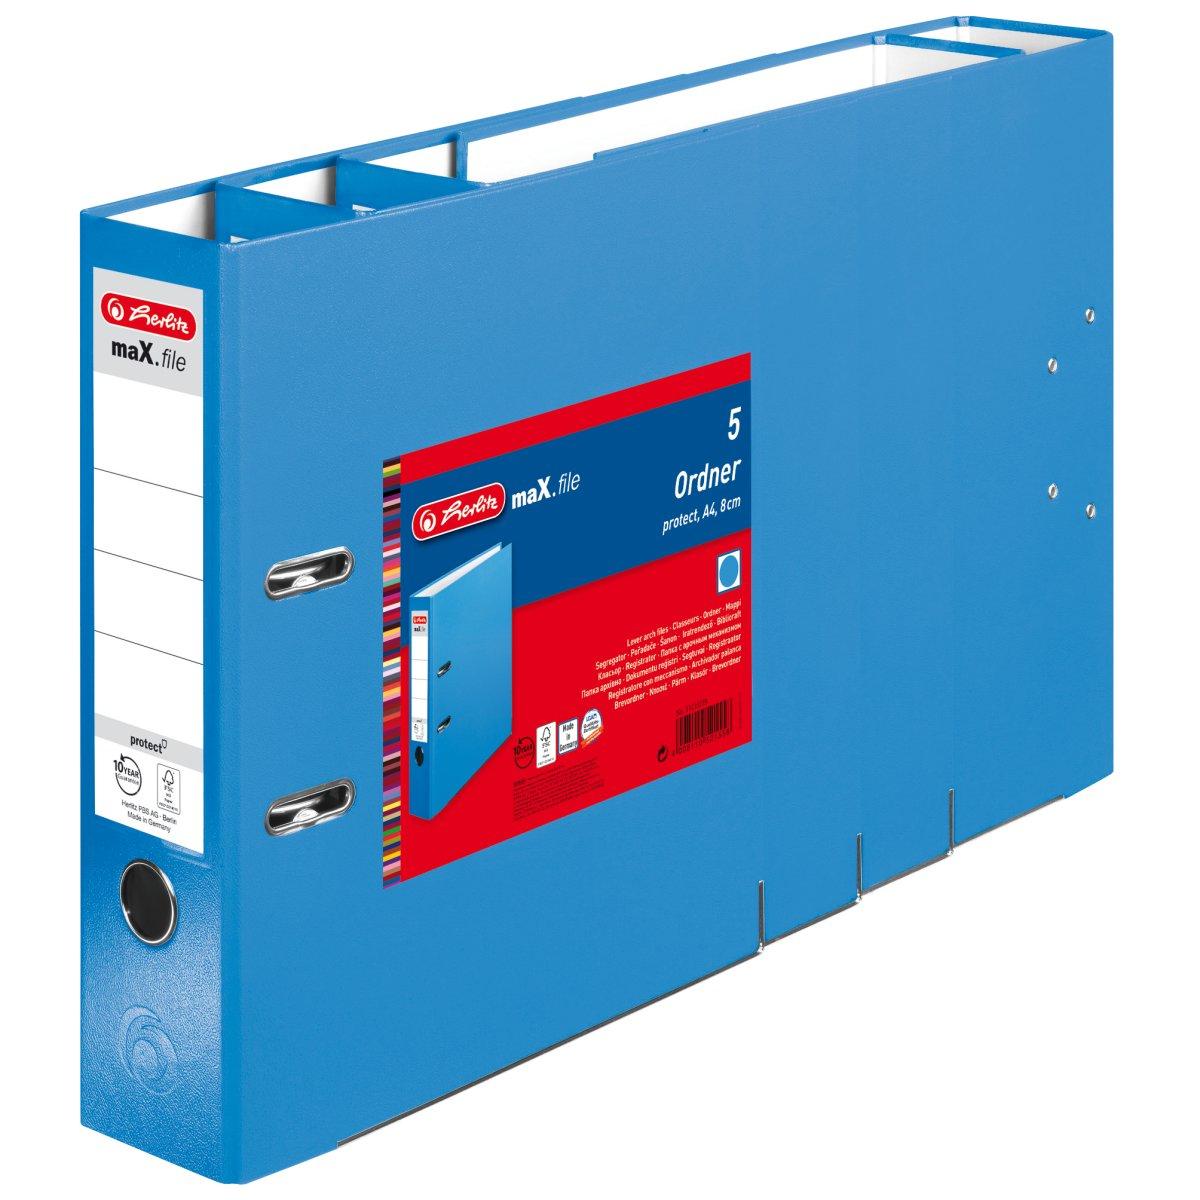 Vorschau: Herlitz 11416278 - 5 Blätter - Blau - Polypropylen (PP) - A4 - 80 mm